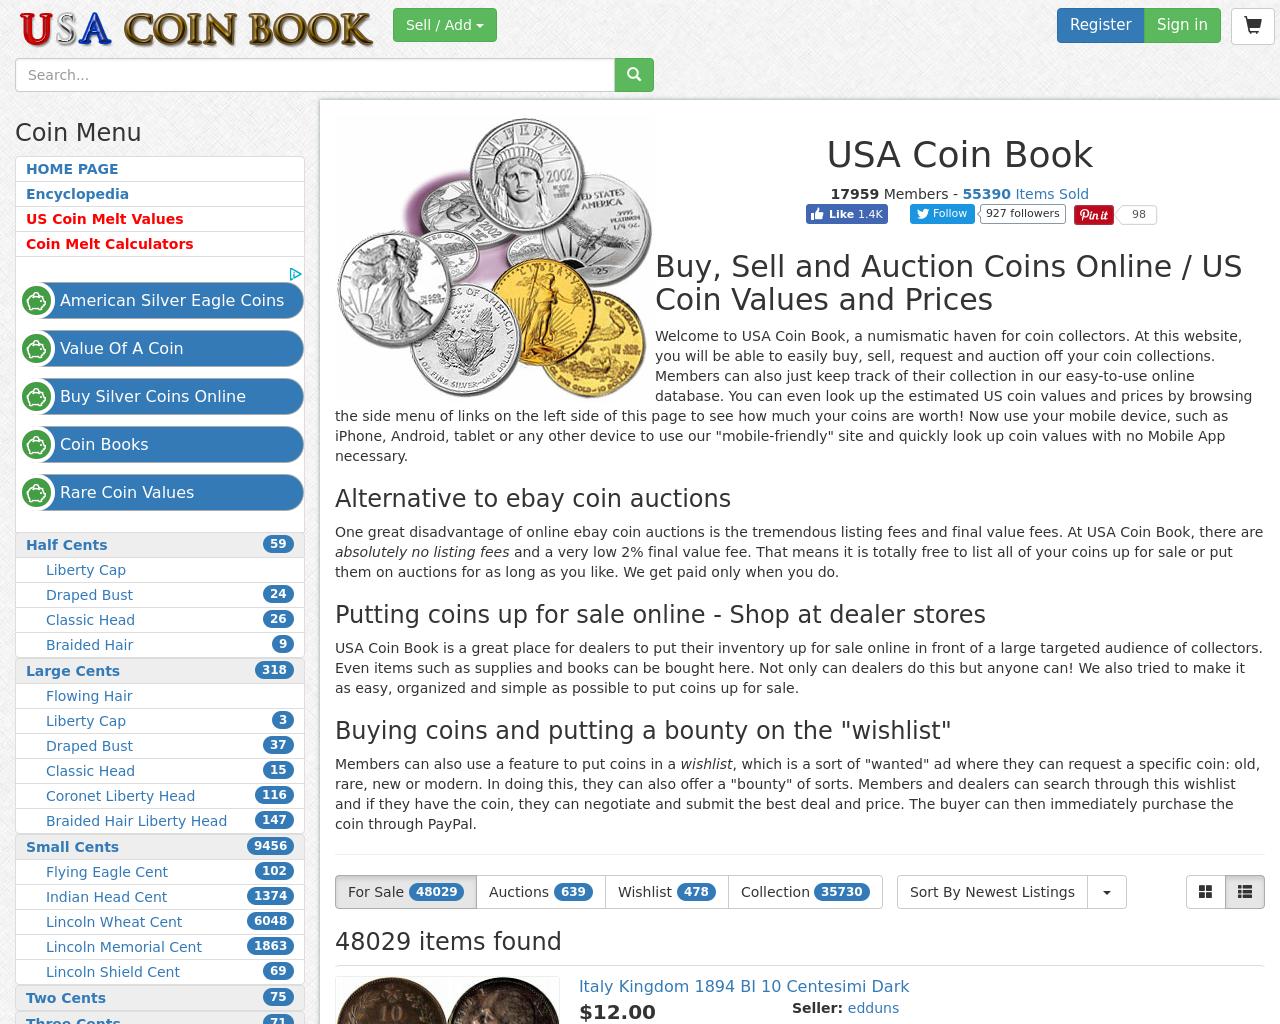 USA-COIN-BOOK-Advertising-Reviews-Pricing